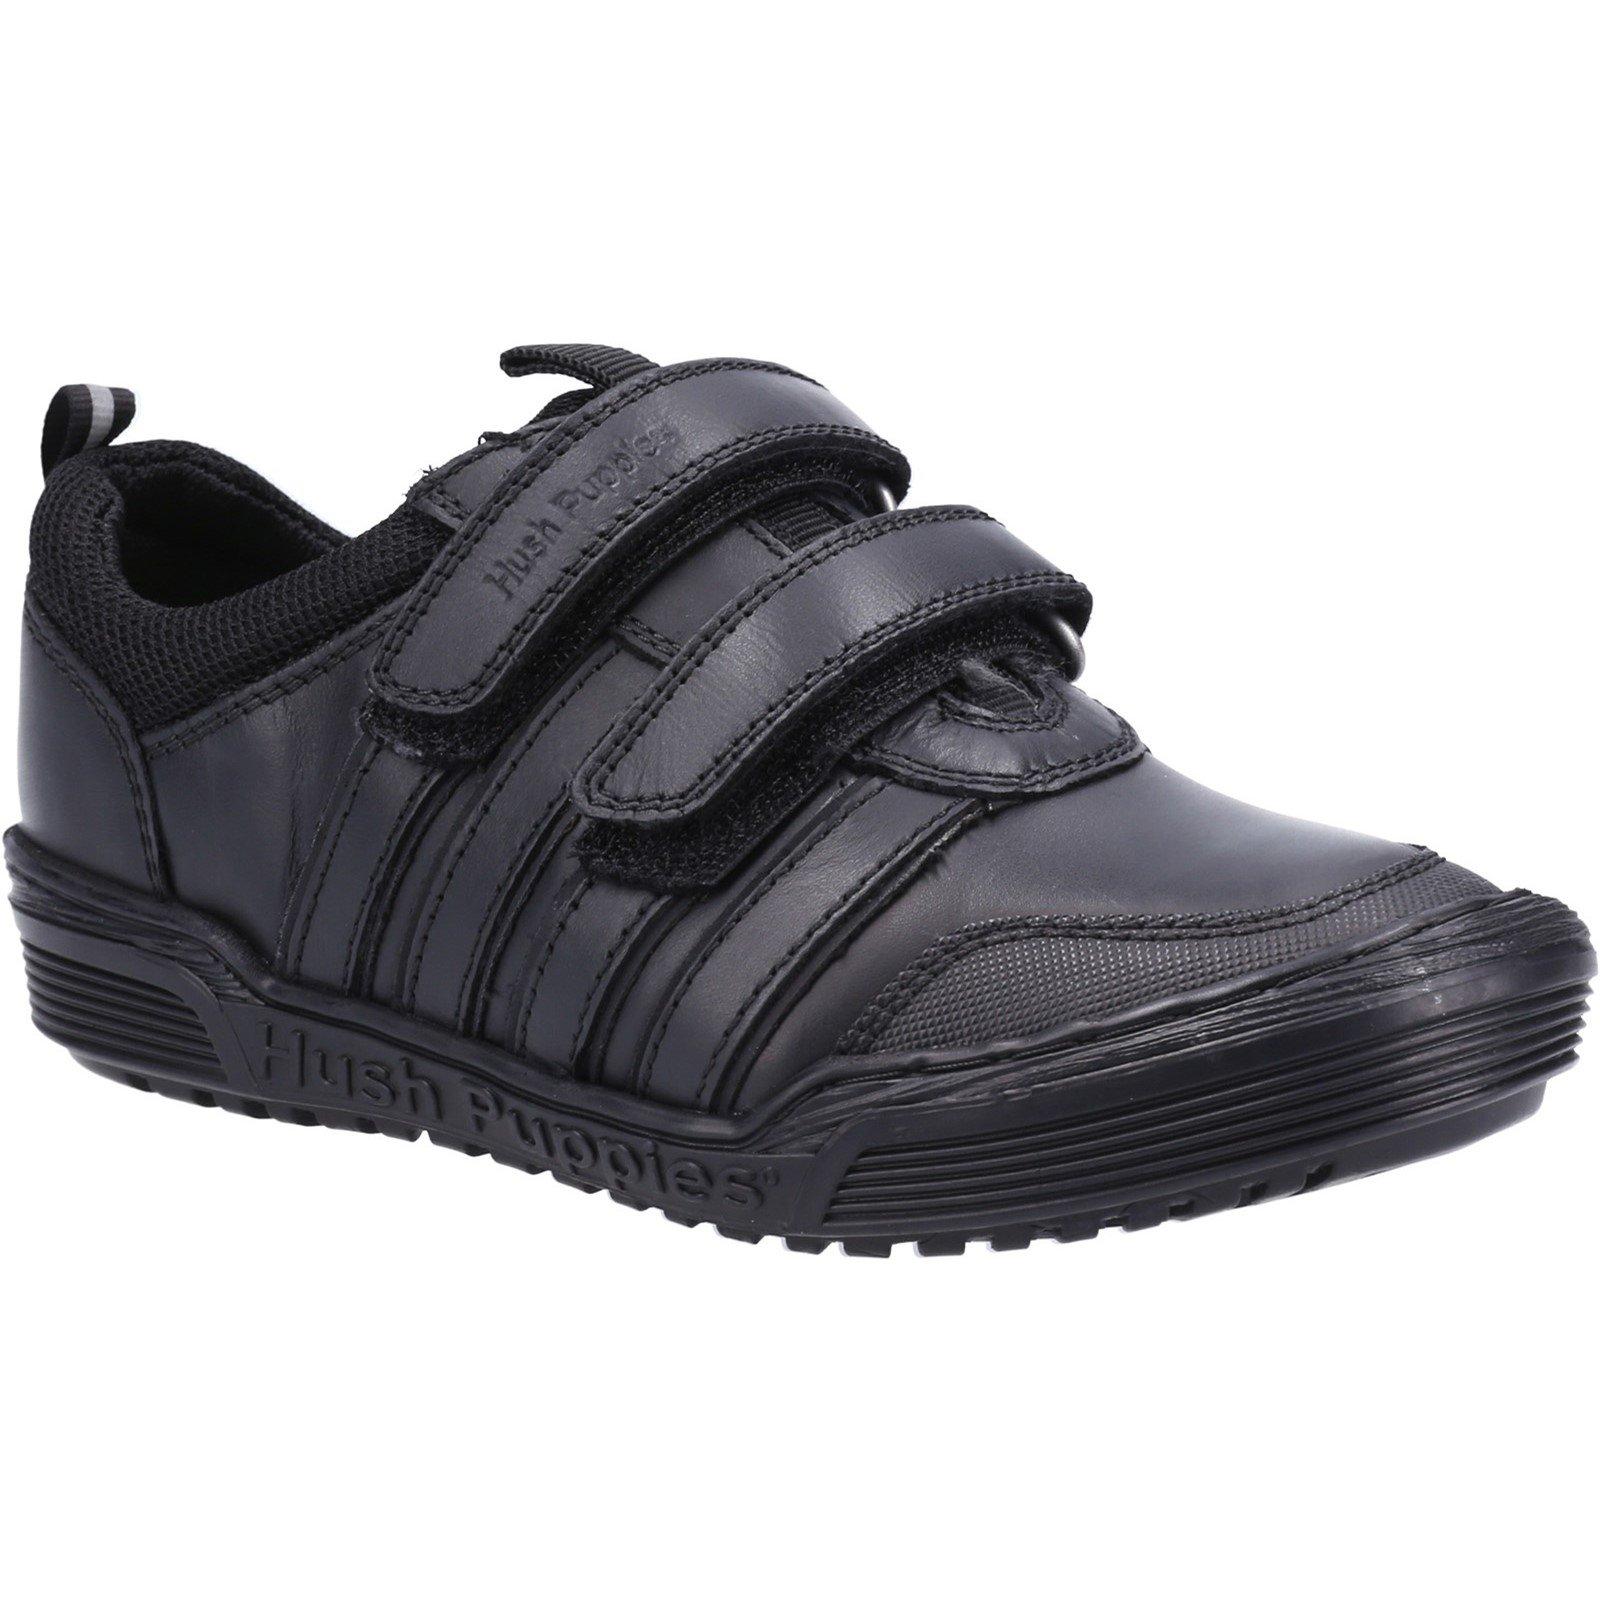 Hush Puppies Kid's Jake School Shoe Black 32736 - Black 13